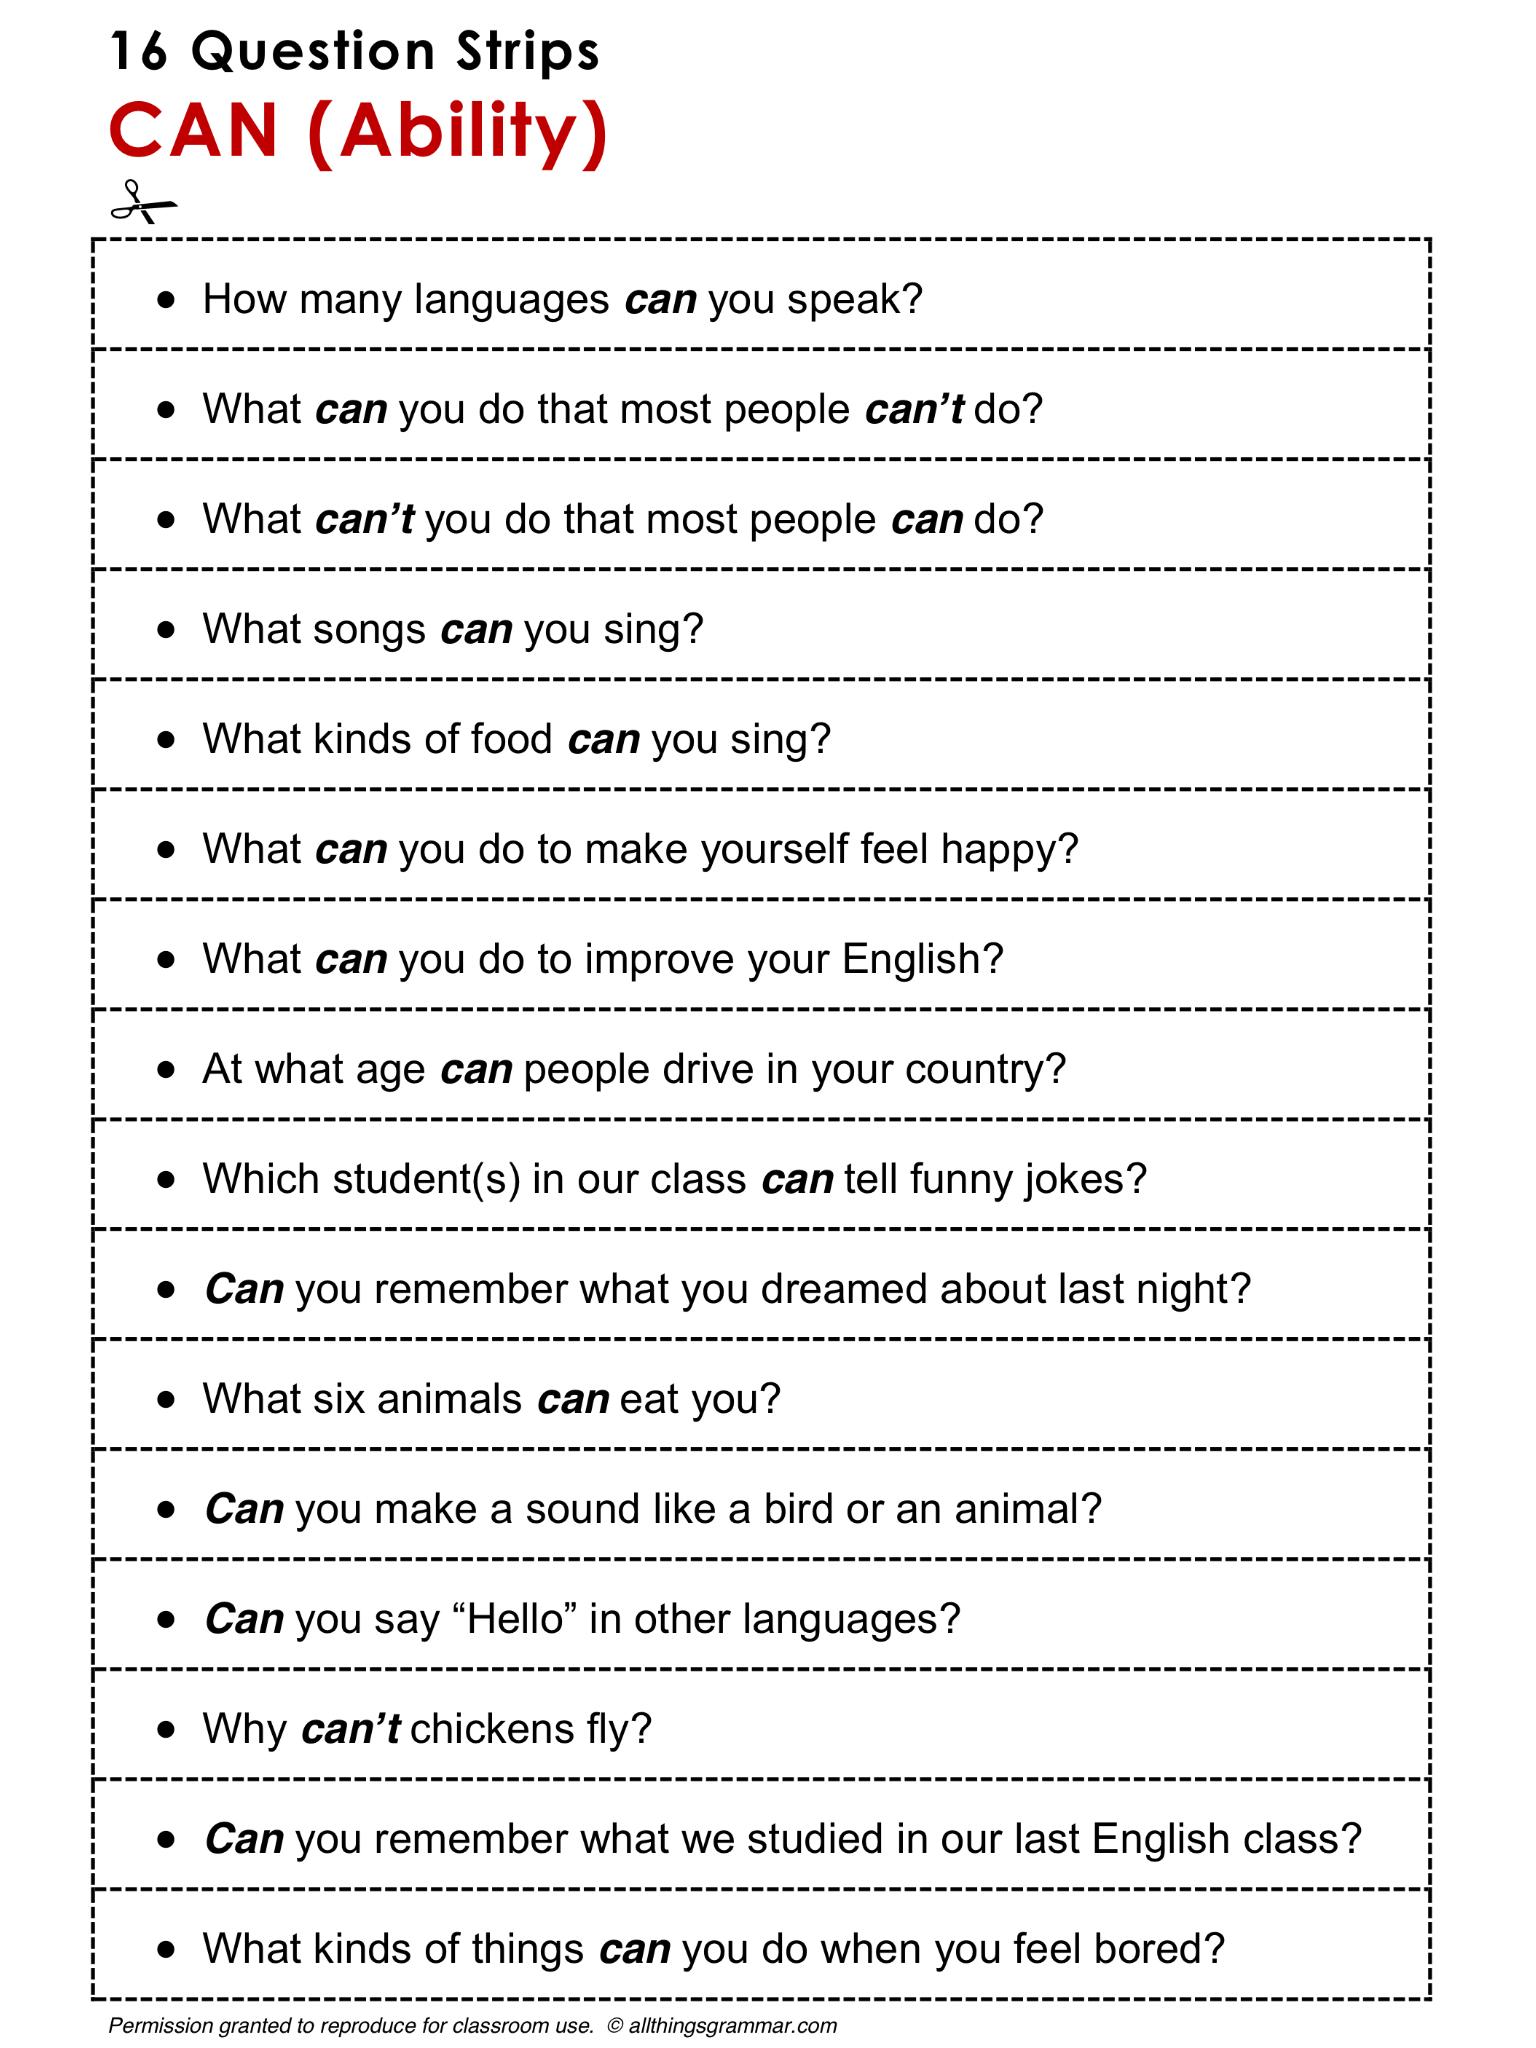 English Grammar Discussion Practice Can Ability 16 Question Strips Http Www Allthingsgram Lecciones De Gramática Educacion Ingles Ingles Para Preescolar